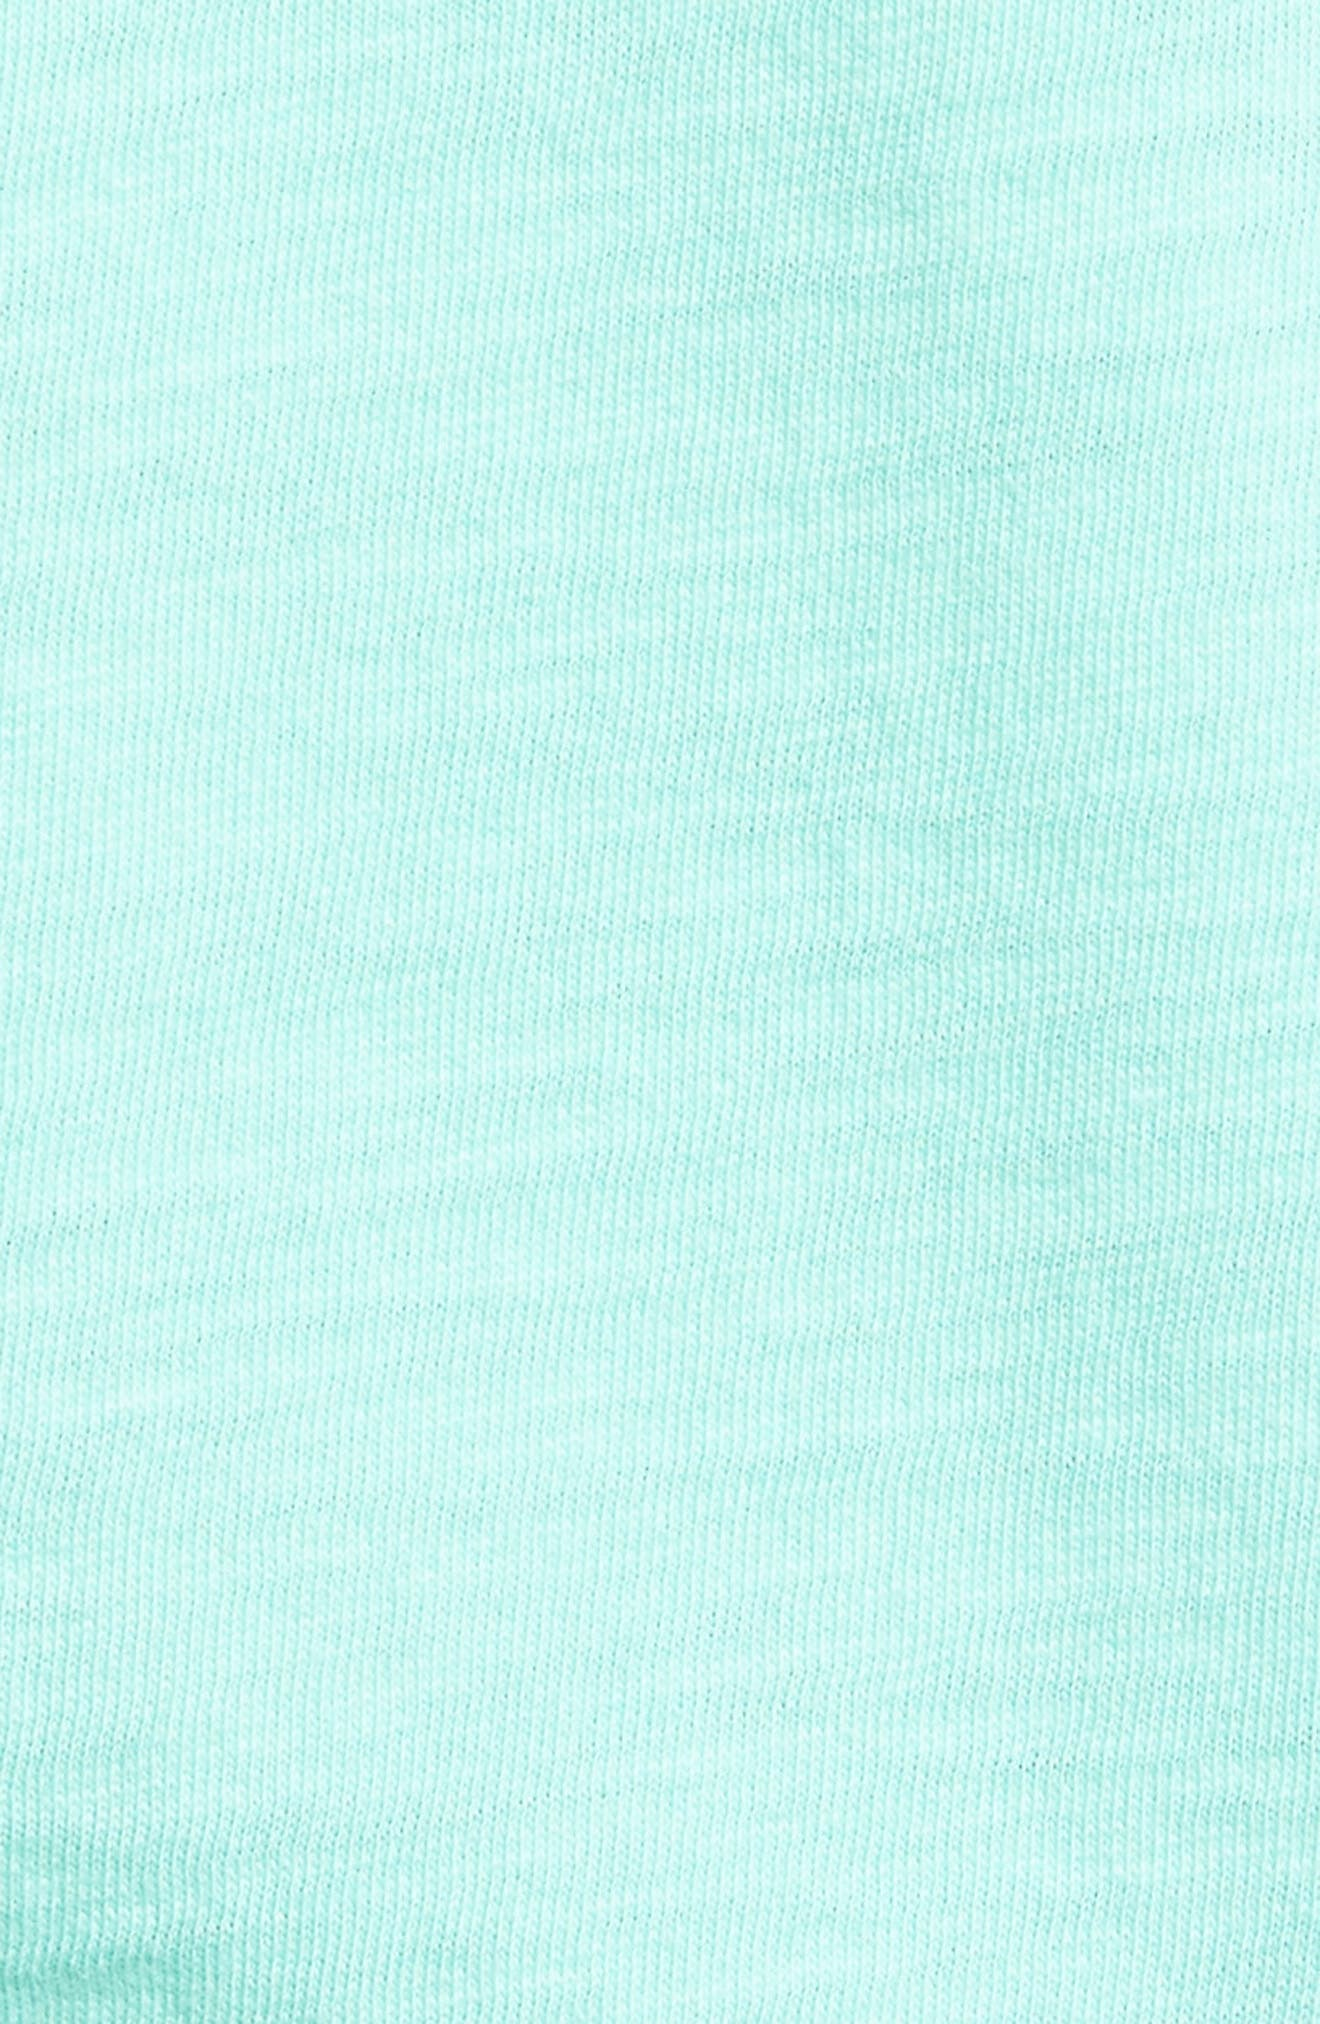 Painted Mahi Graphic Slub T-Shirt,                             Alternate thumbnail 5, color,